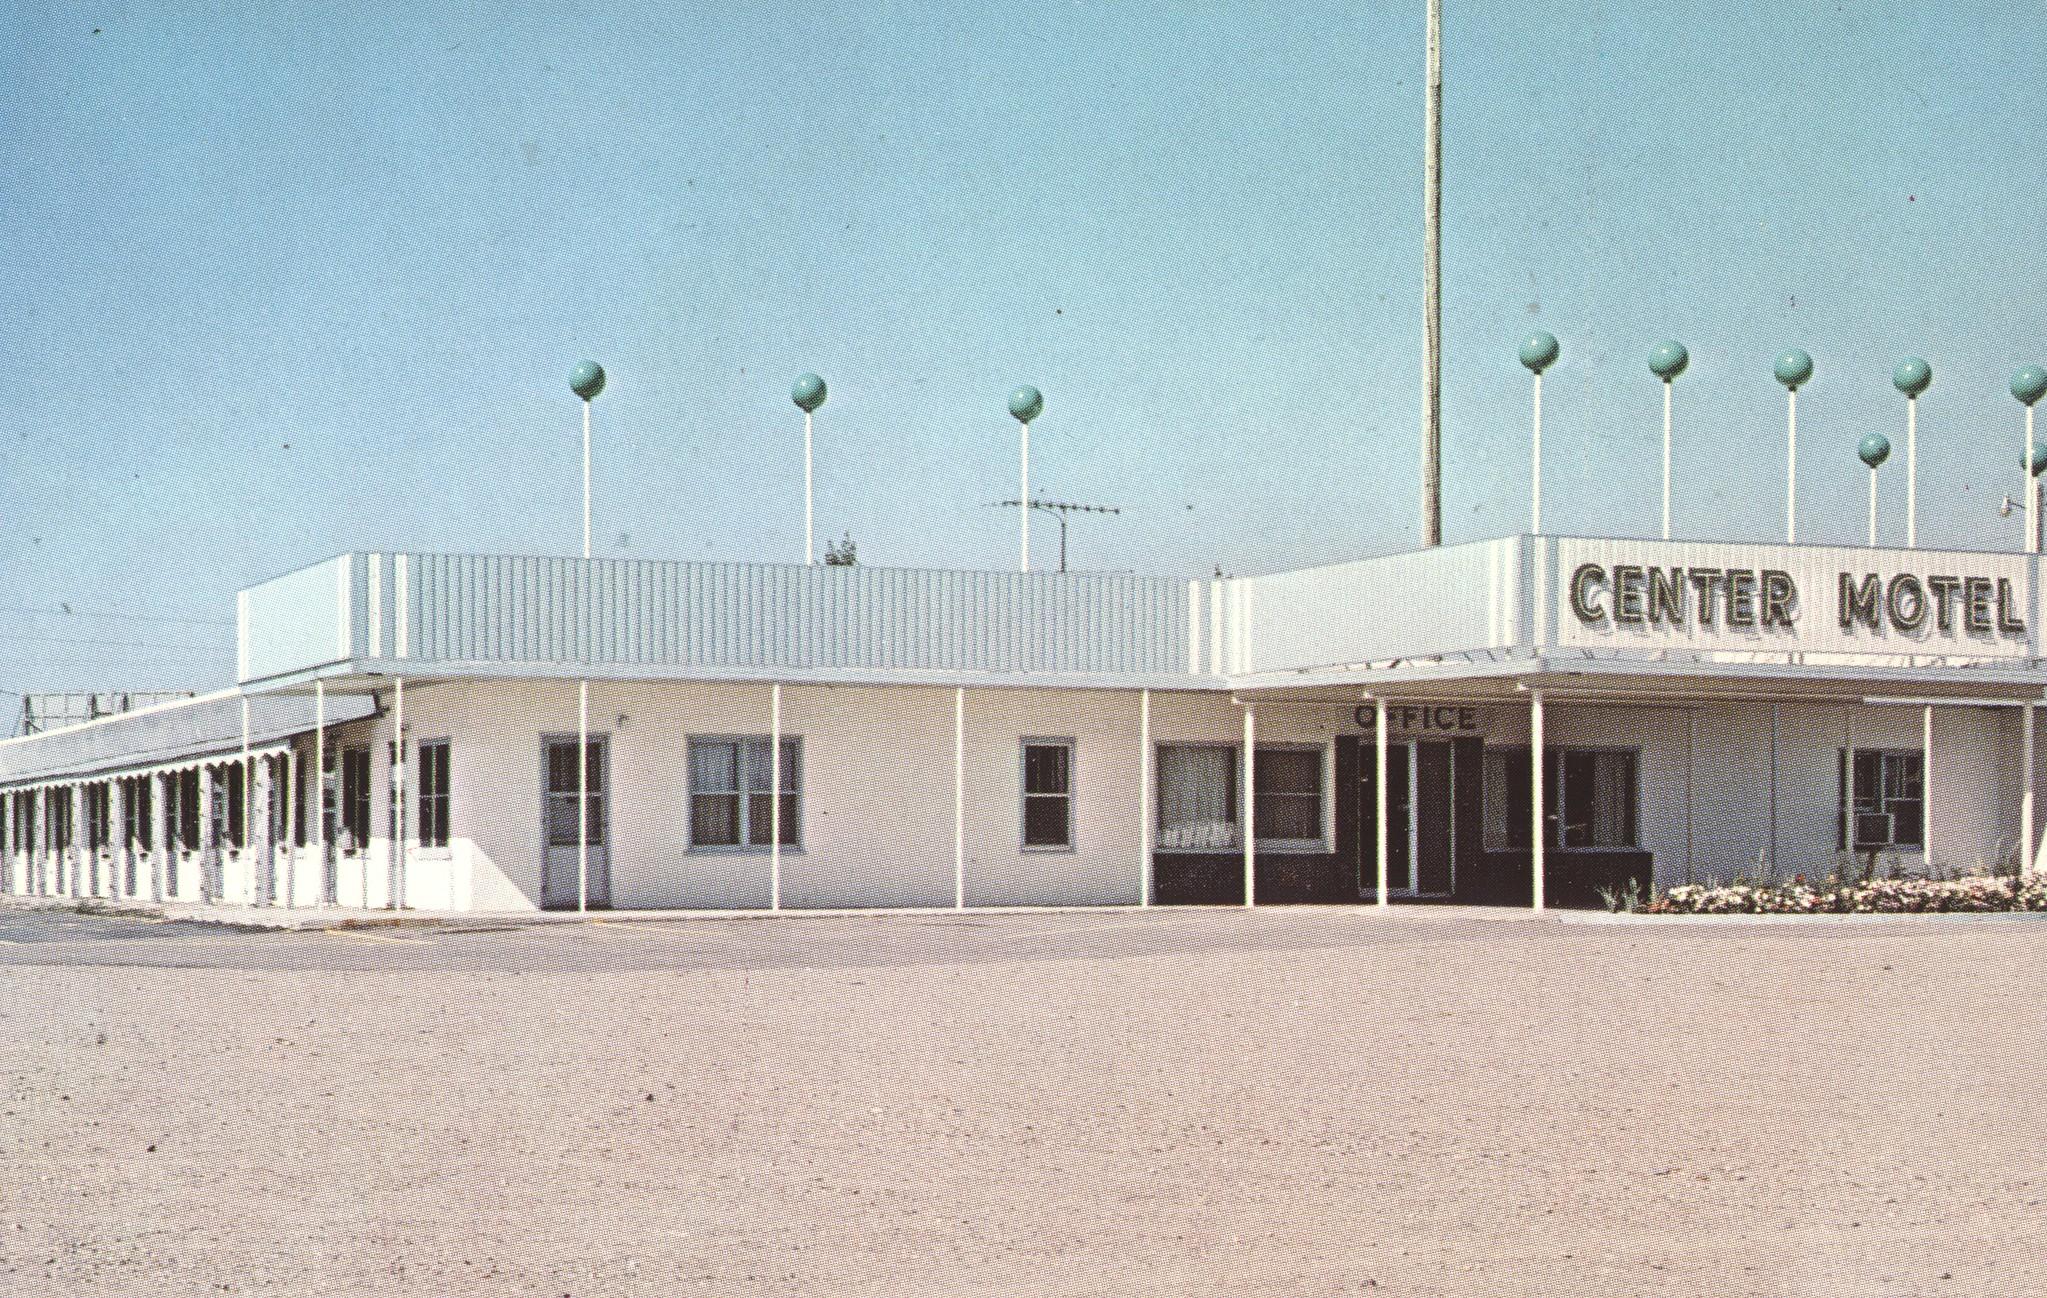 Center Motel - Rugby, North Dakota